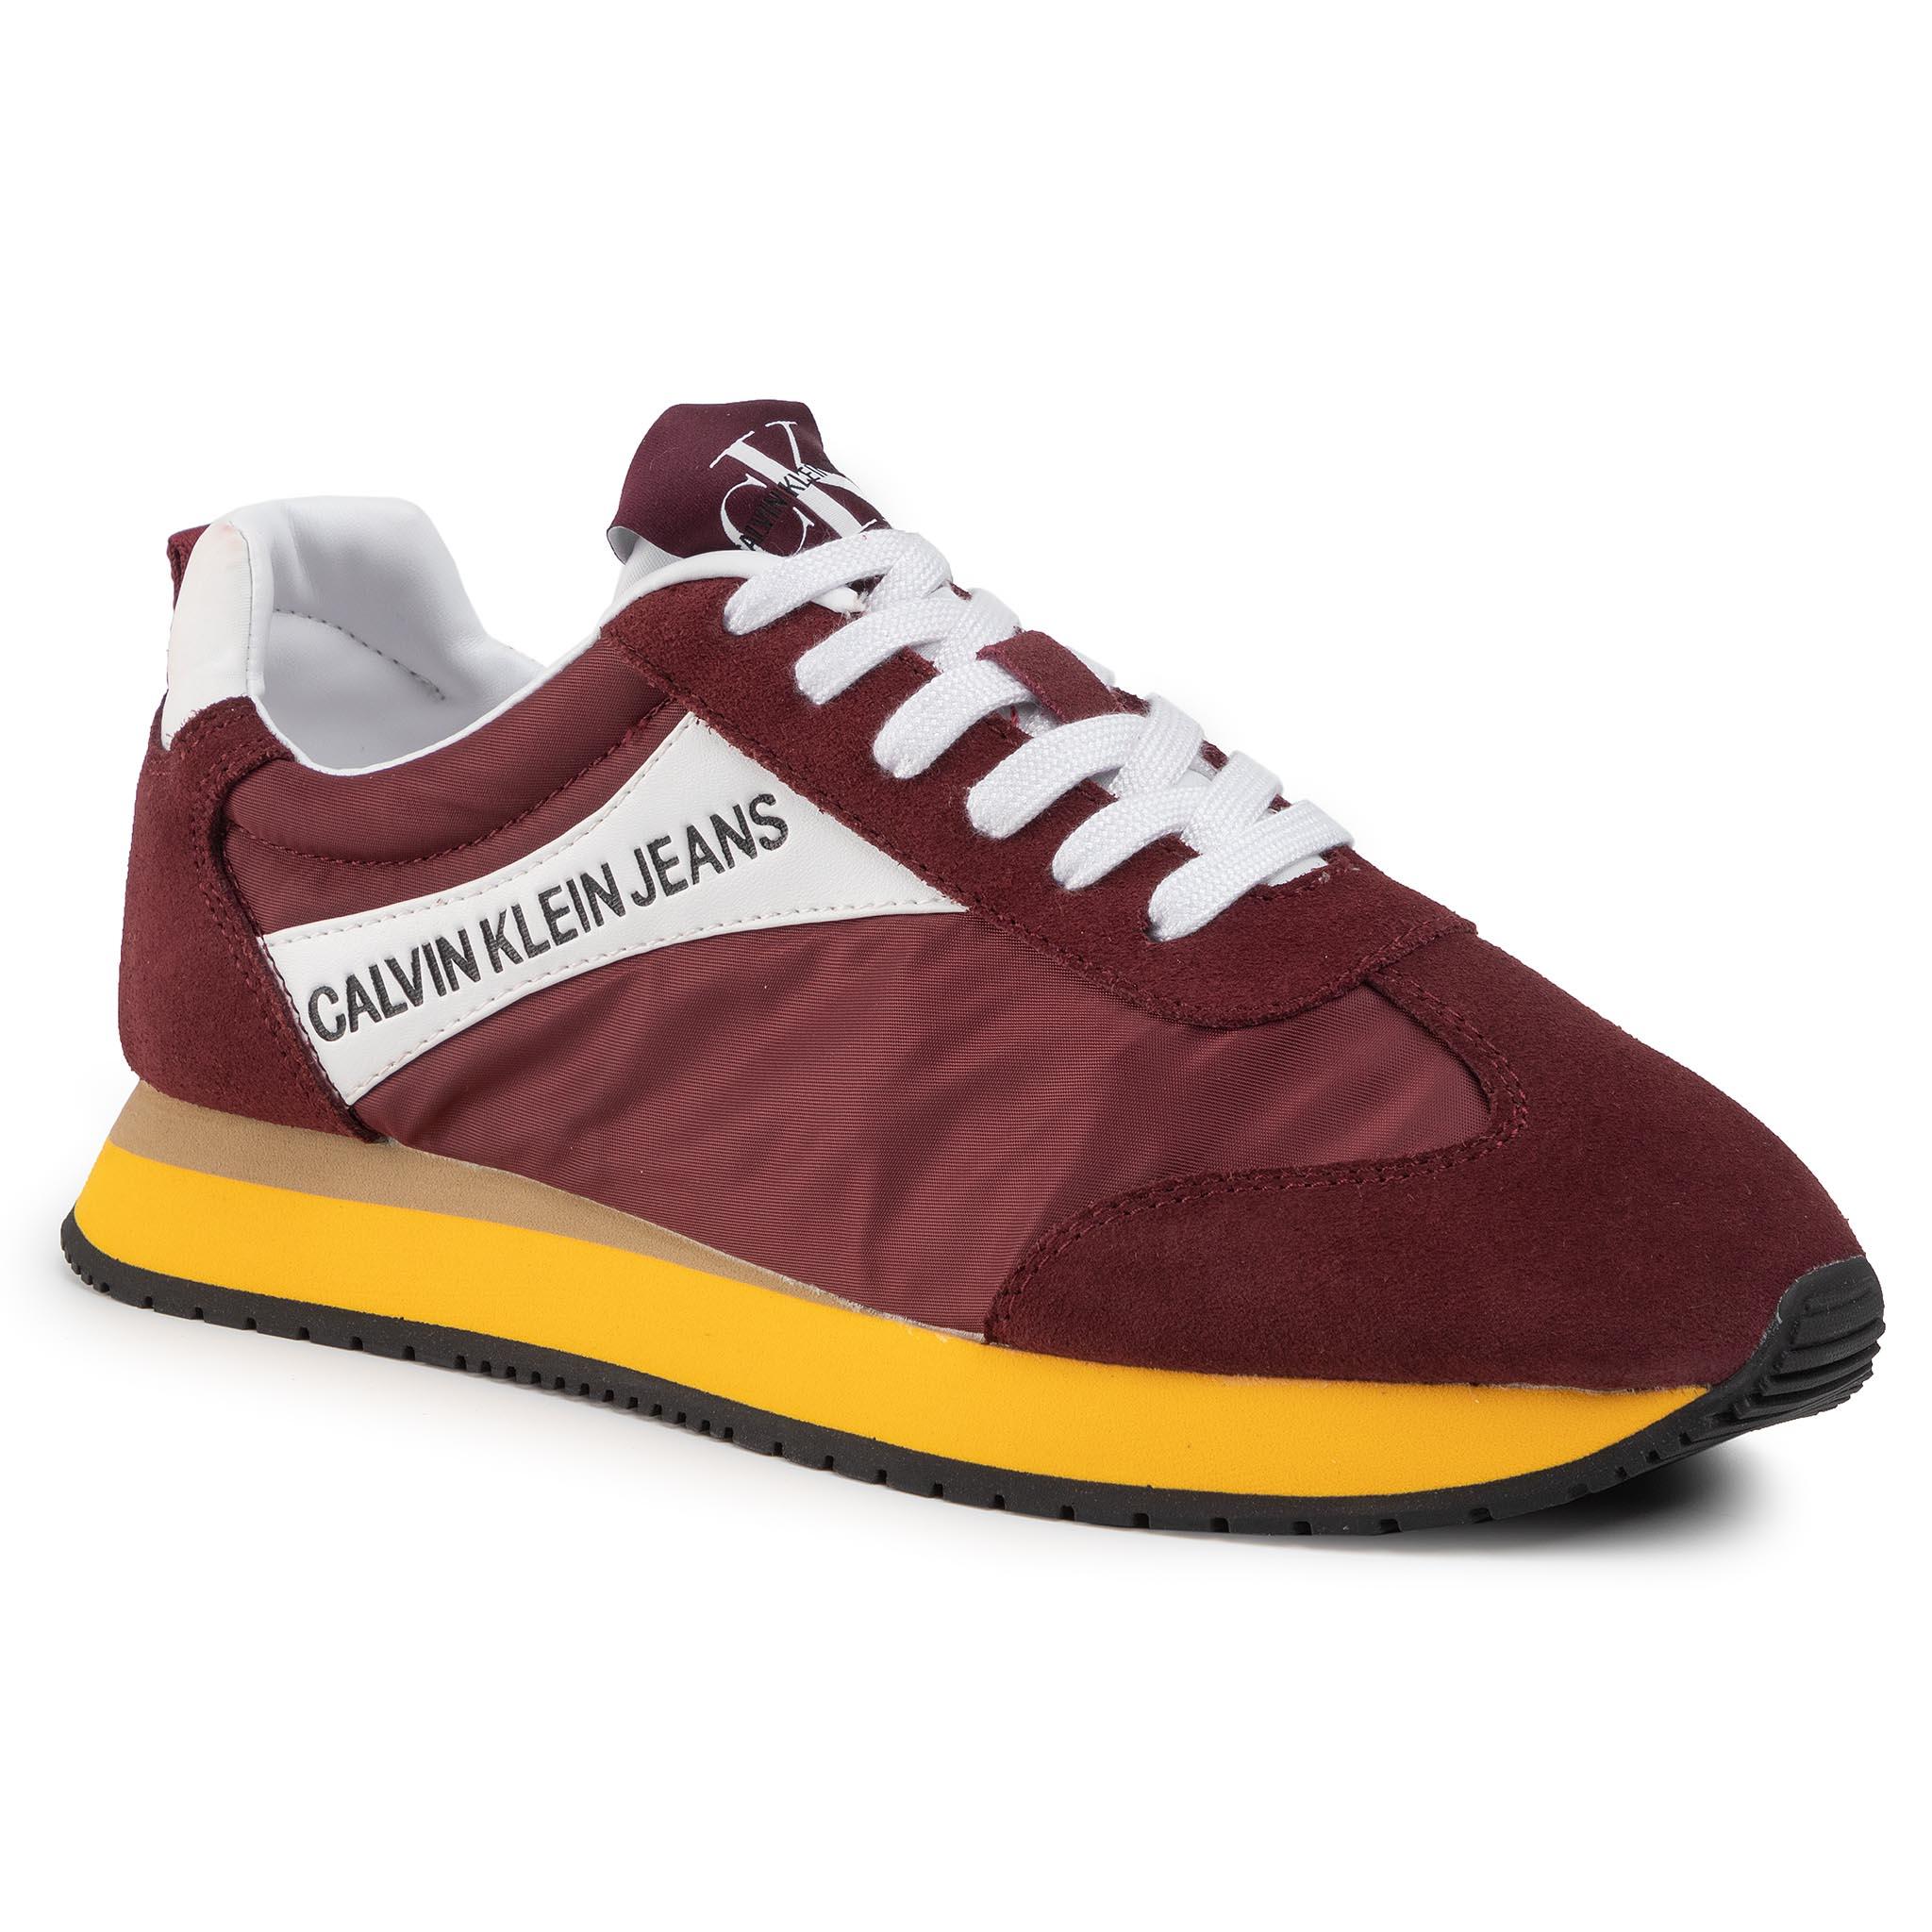 Image of Sneakers CALVIN KLEIN JEANS - Jerrold S0615 Multi Beet Red